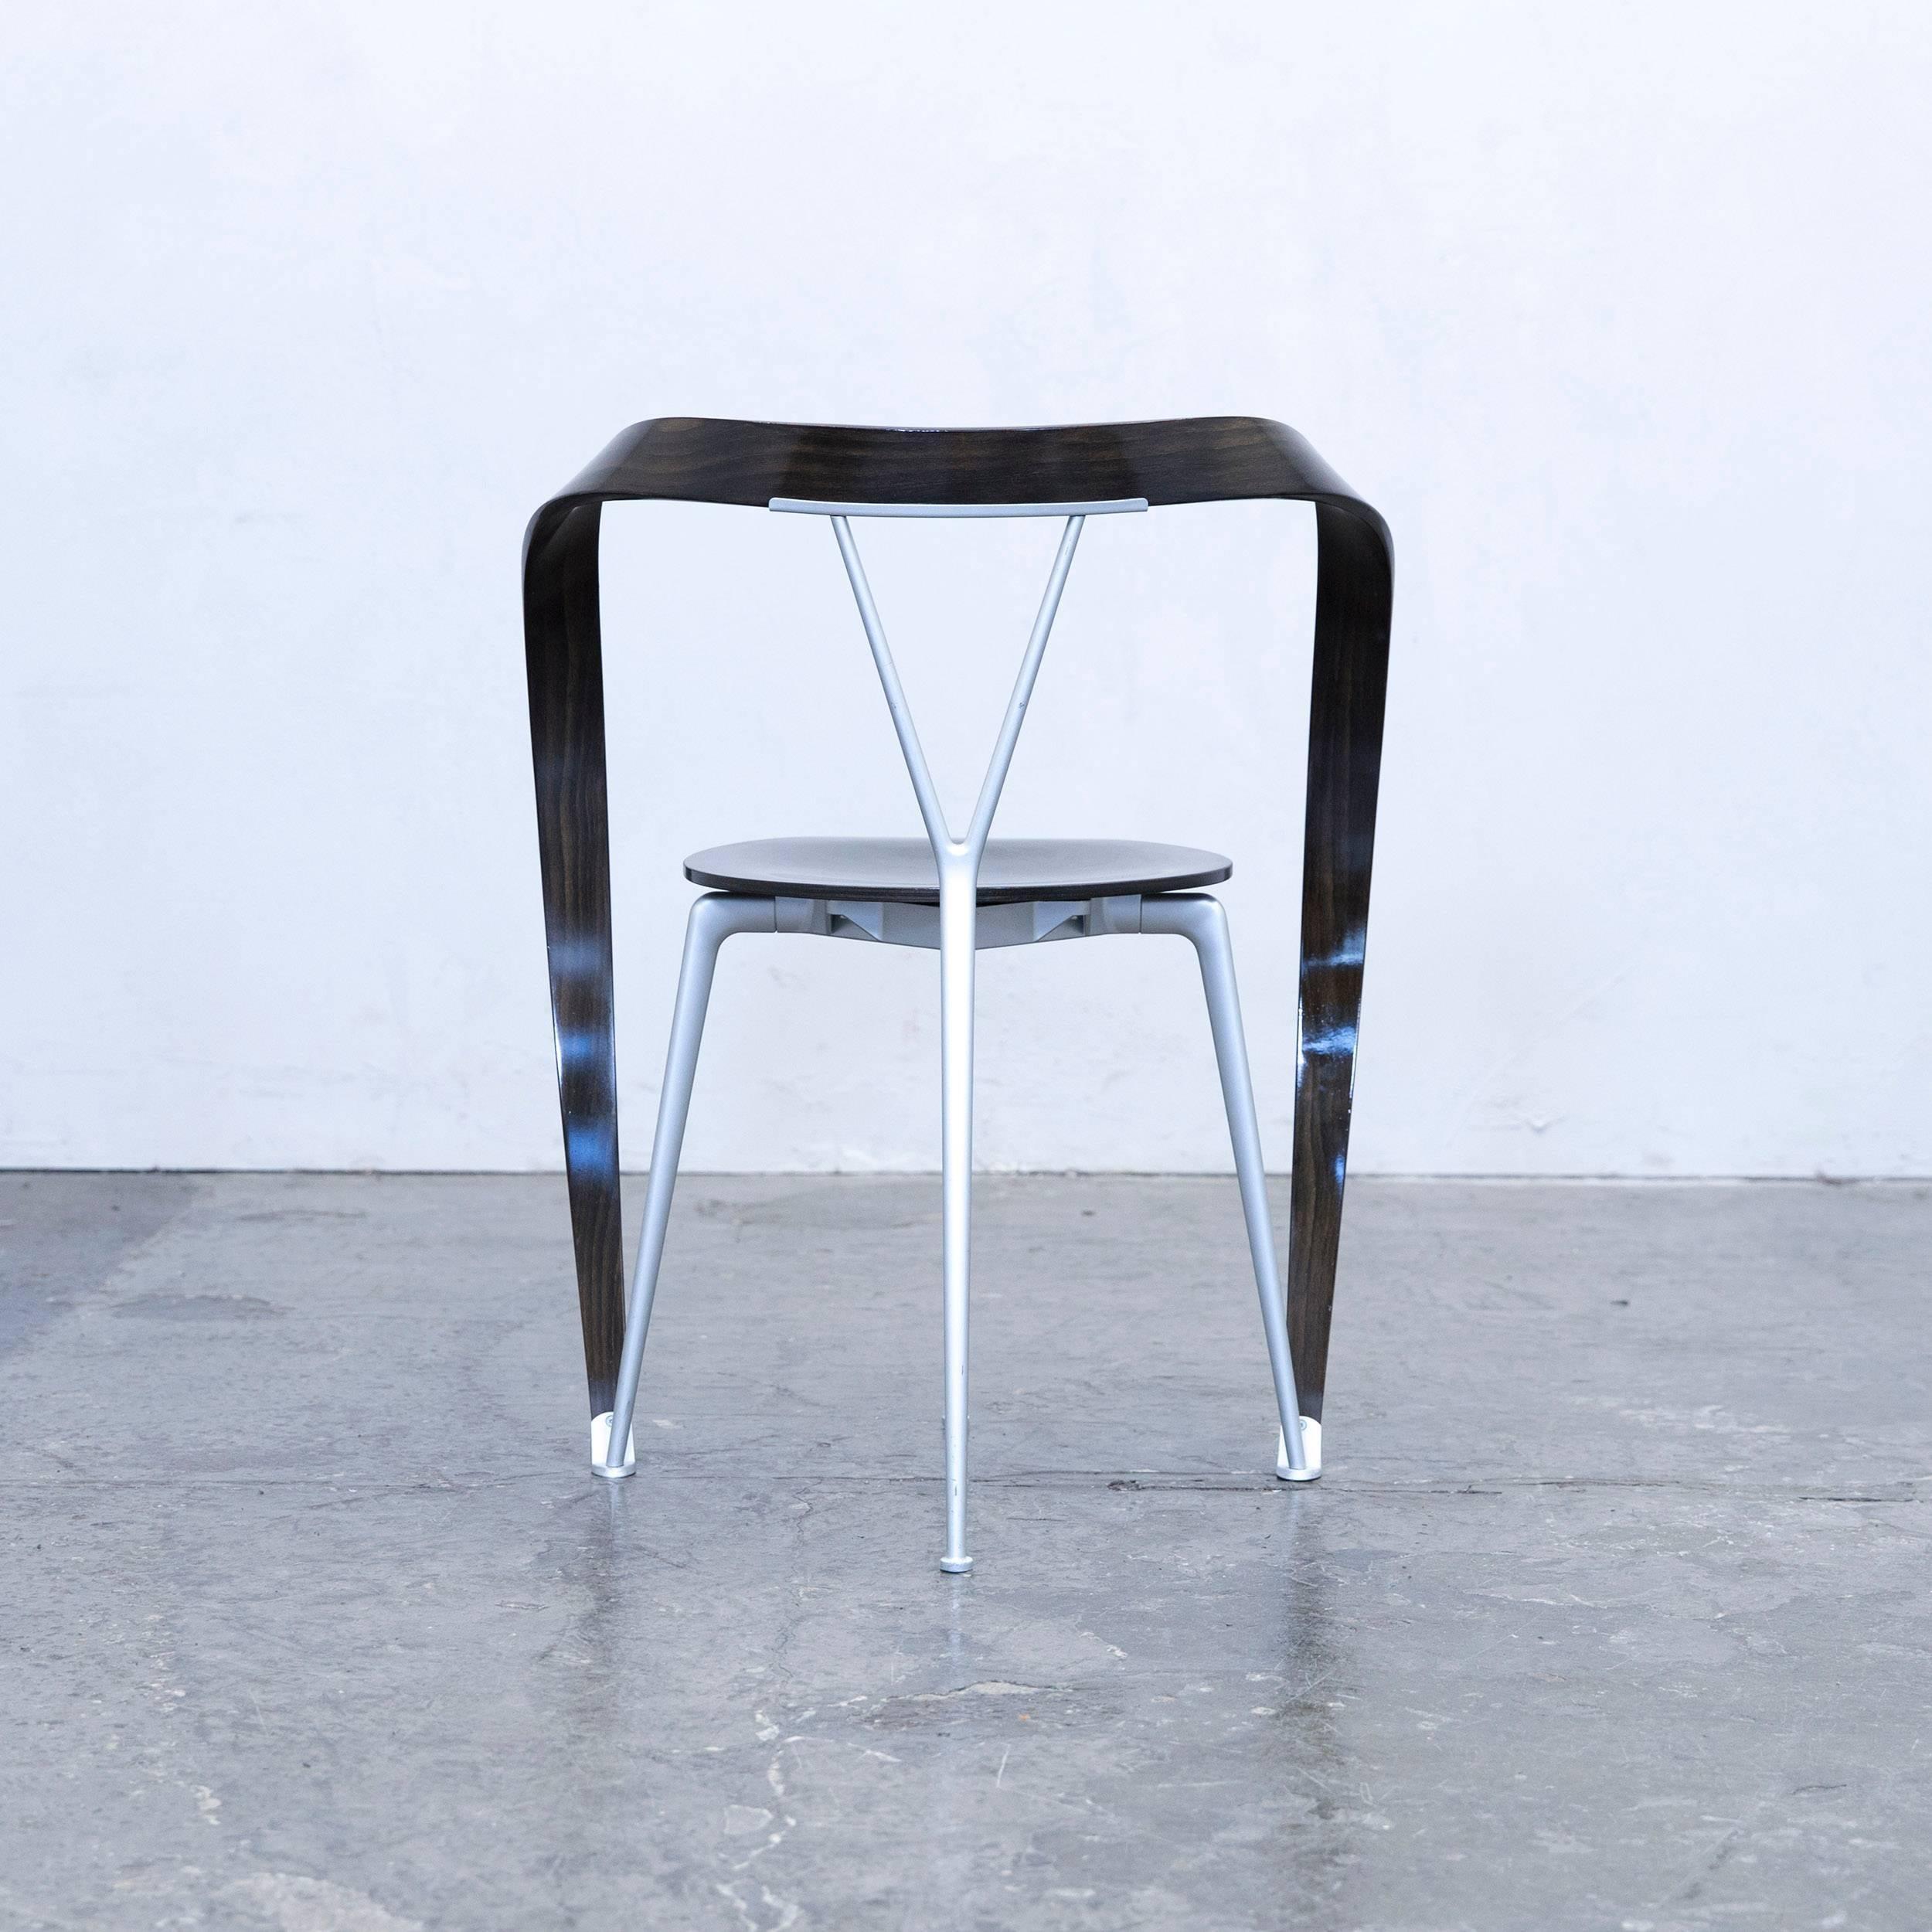 Wonderful Sessel Modern Design Collection Of Cassina Revers Andrea Branzi Designer Chair Wood